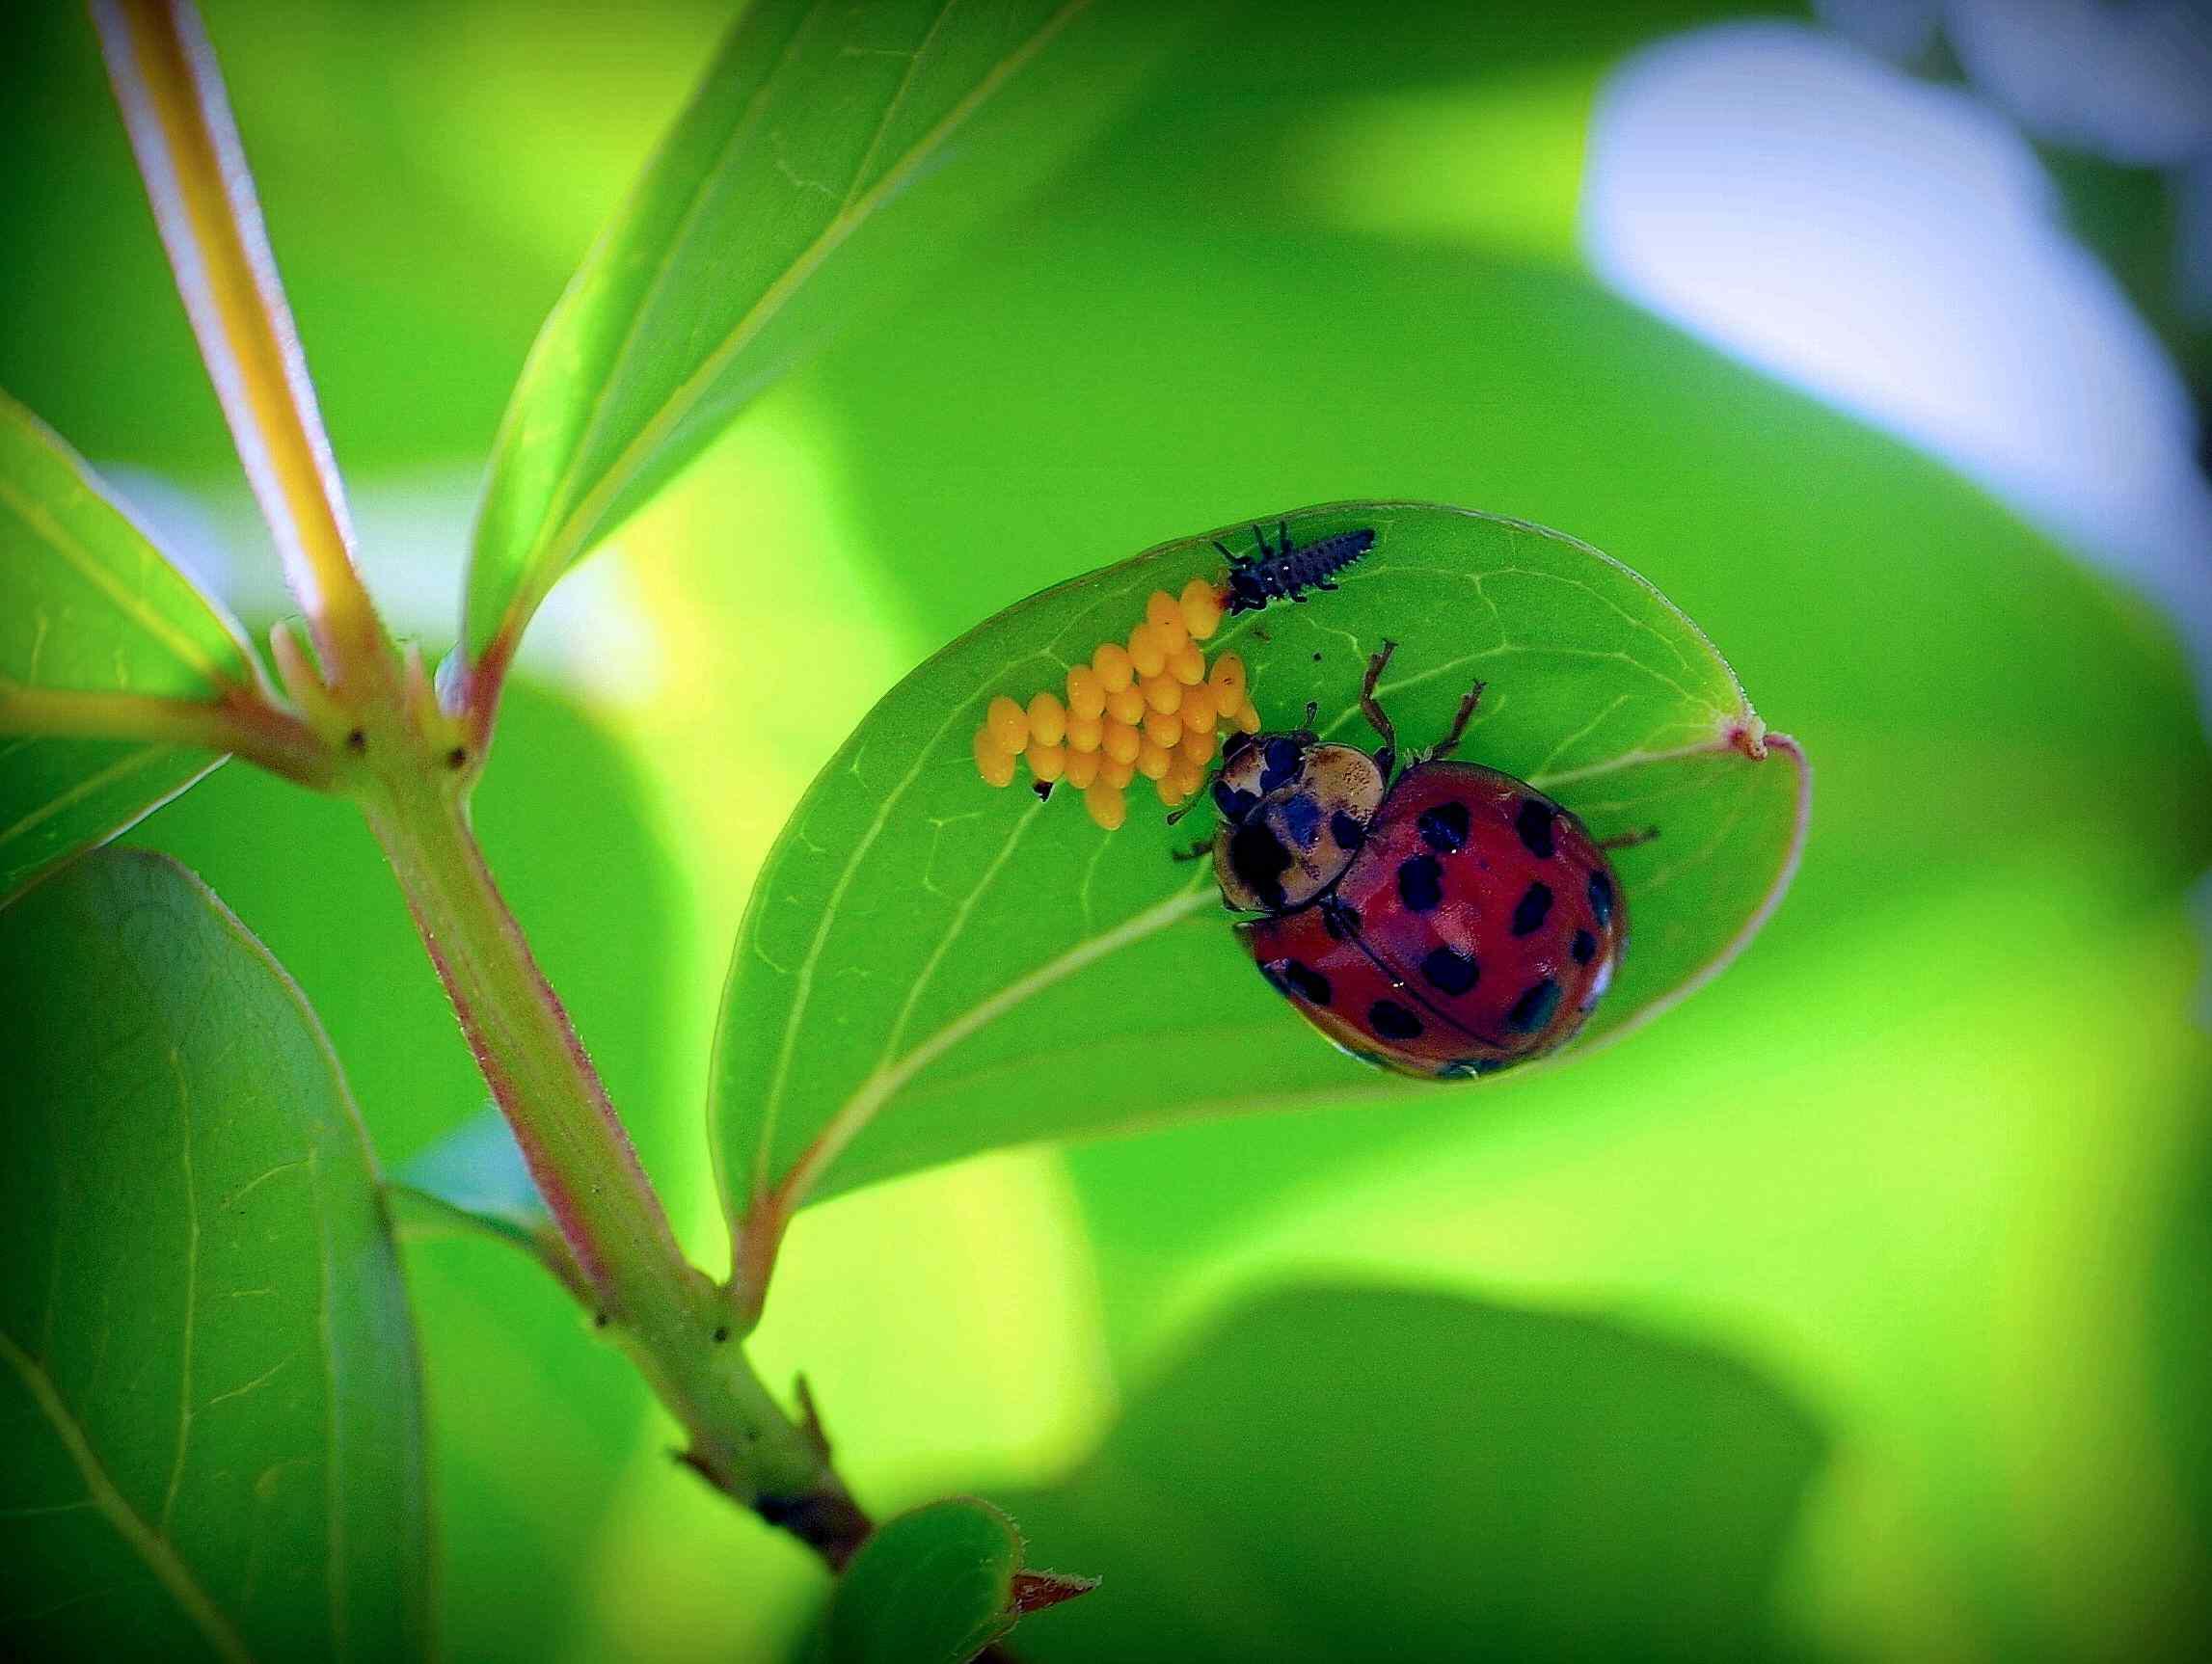 ladybug on underside of leaf tending to its eggs